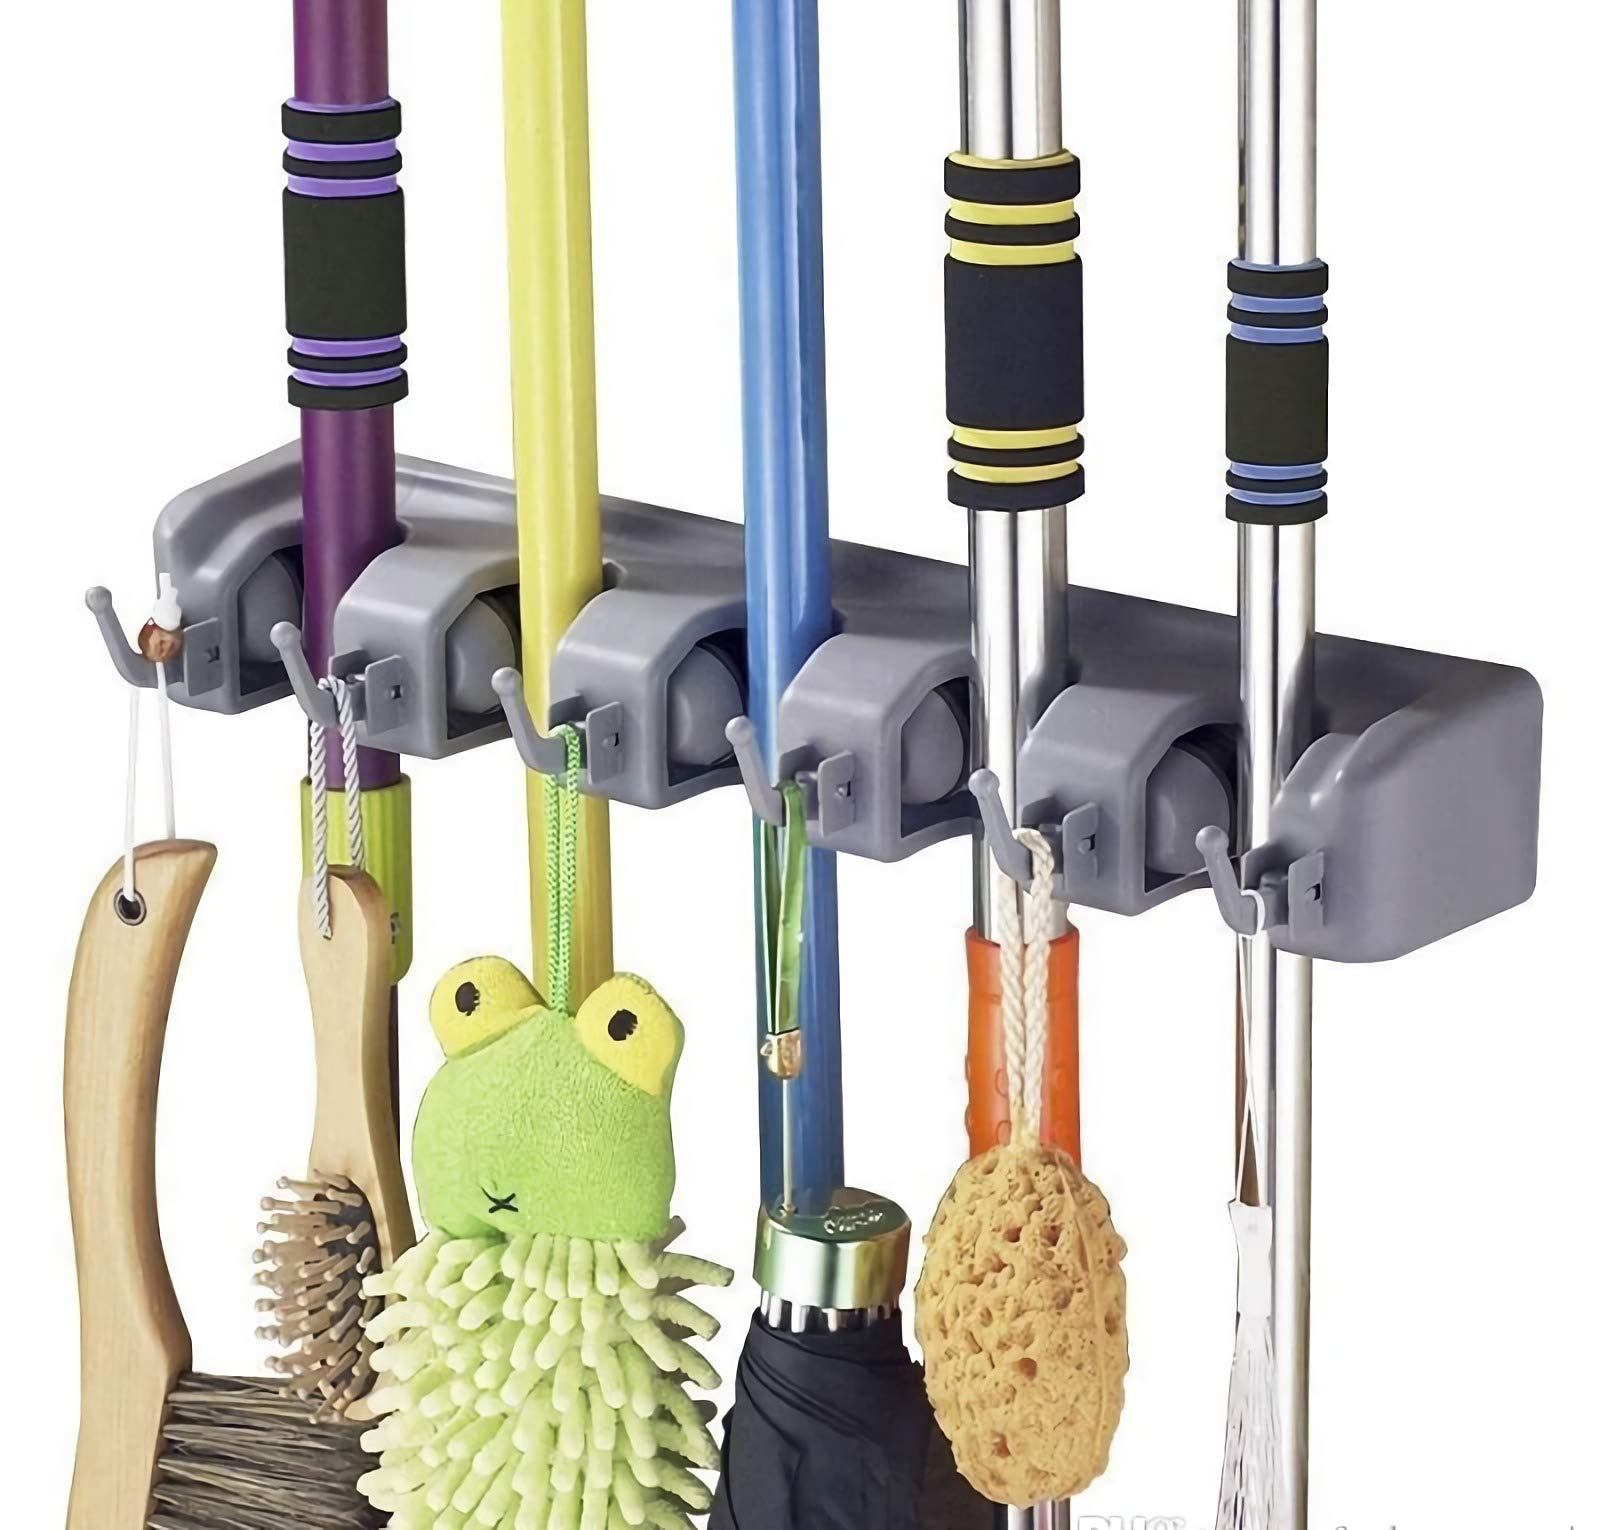 Multi-Function Mop Broom Holder Wall Mounted 5 Position 6 Hooks Organizer Storage System Mop Broom Holder